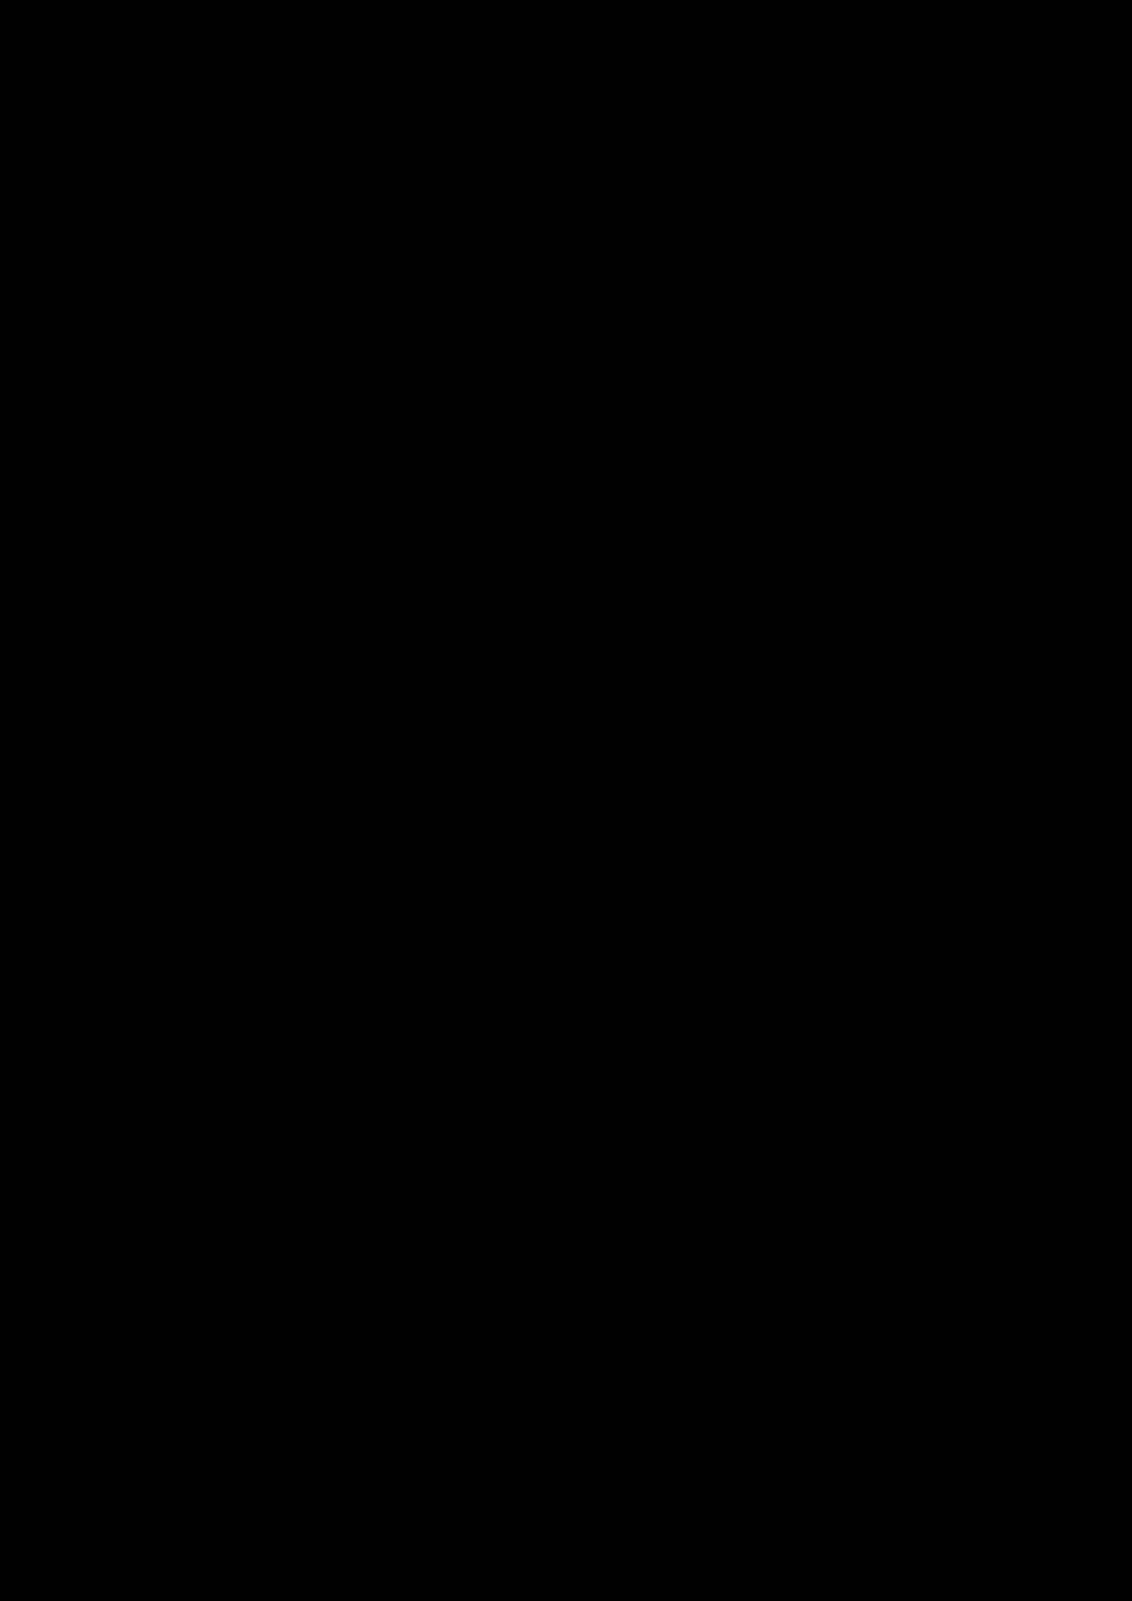 Belyiy sokol slide, Image 89